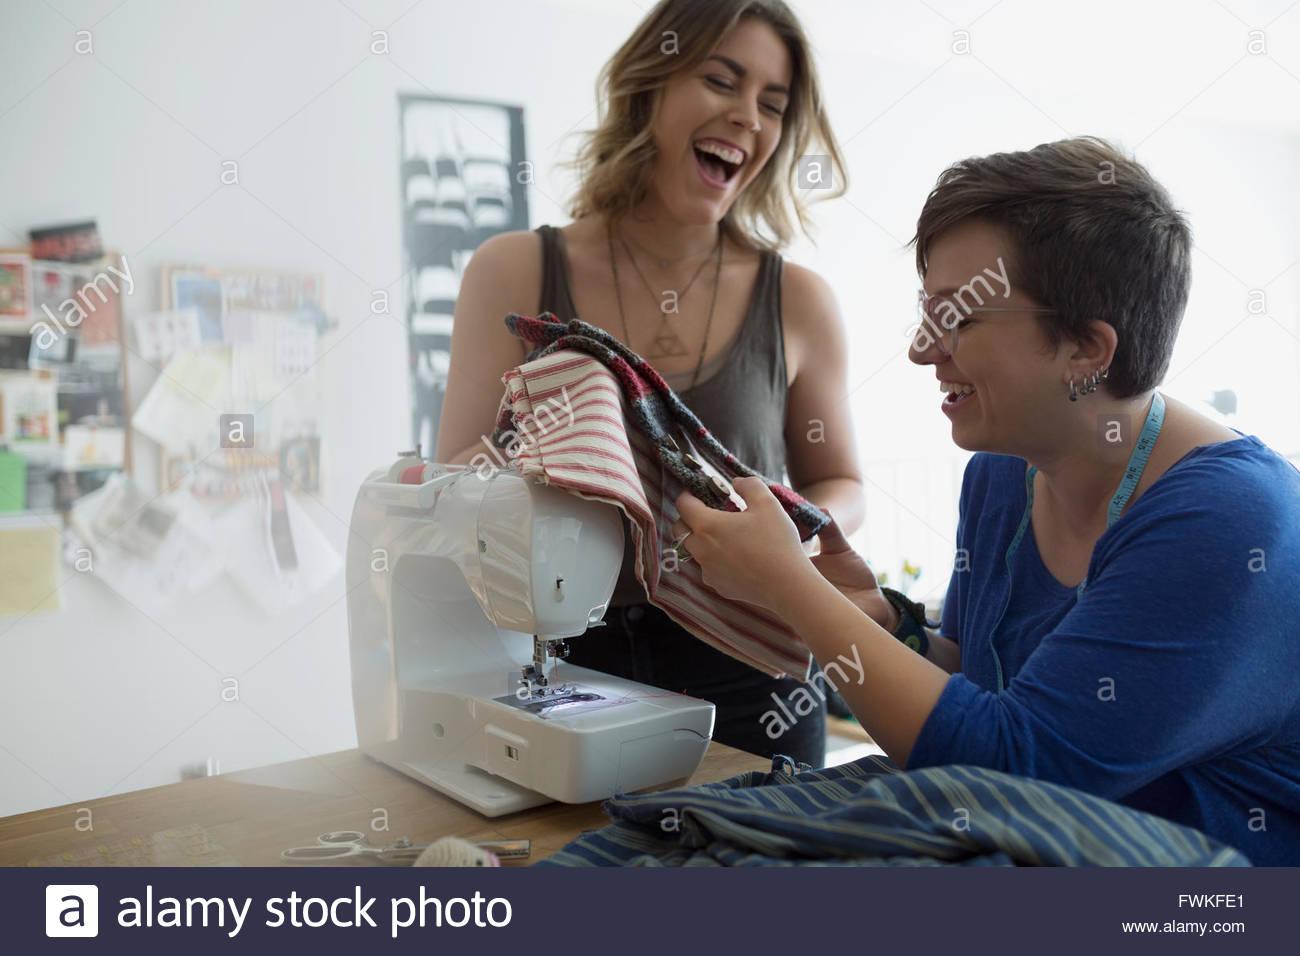 Laughing seamstresses examining fabric at sewing machine - Stock Image